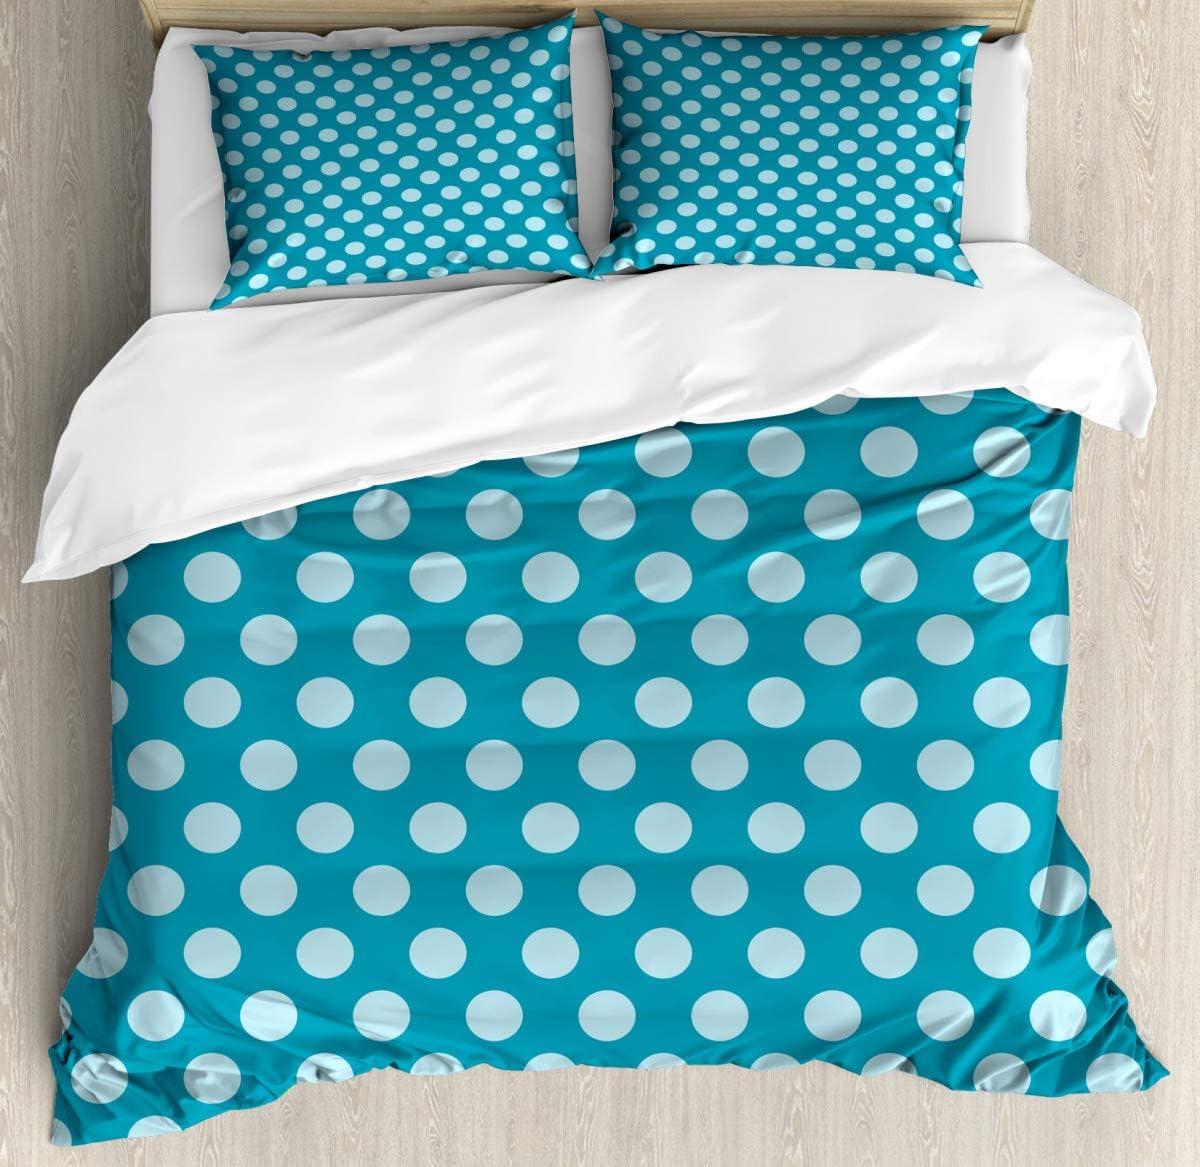 "Bedding Set Twin Duvet Cover SetPolka Dots Soft Sea Colors Duvet Cover SetMicrofiber Decoration Room home86 x94/19""x29""inch"